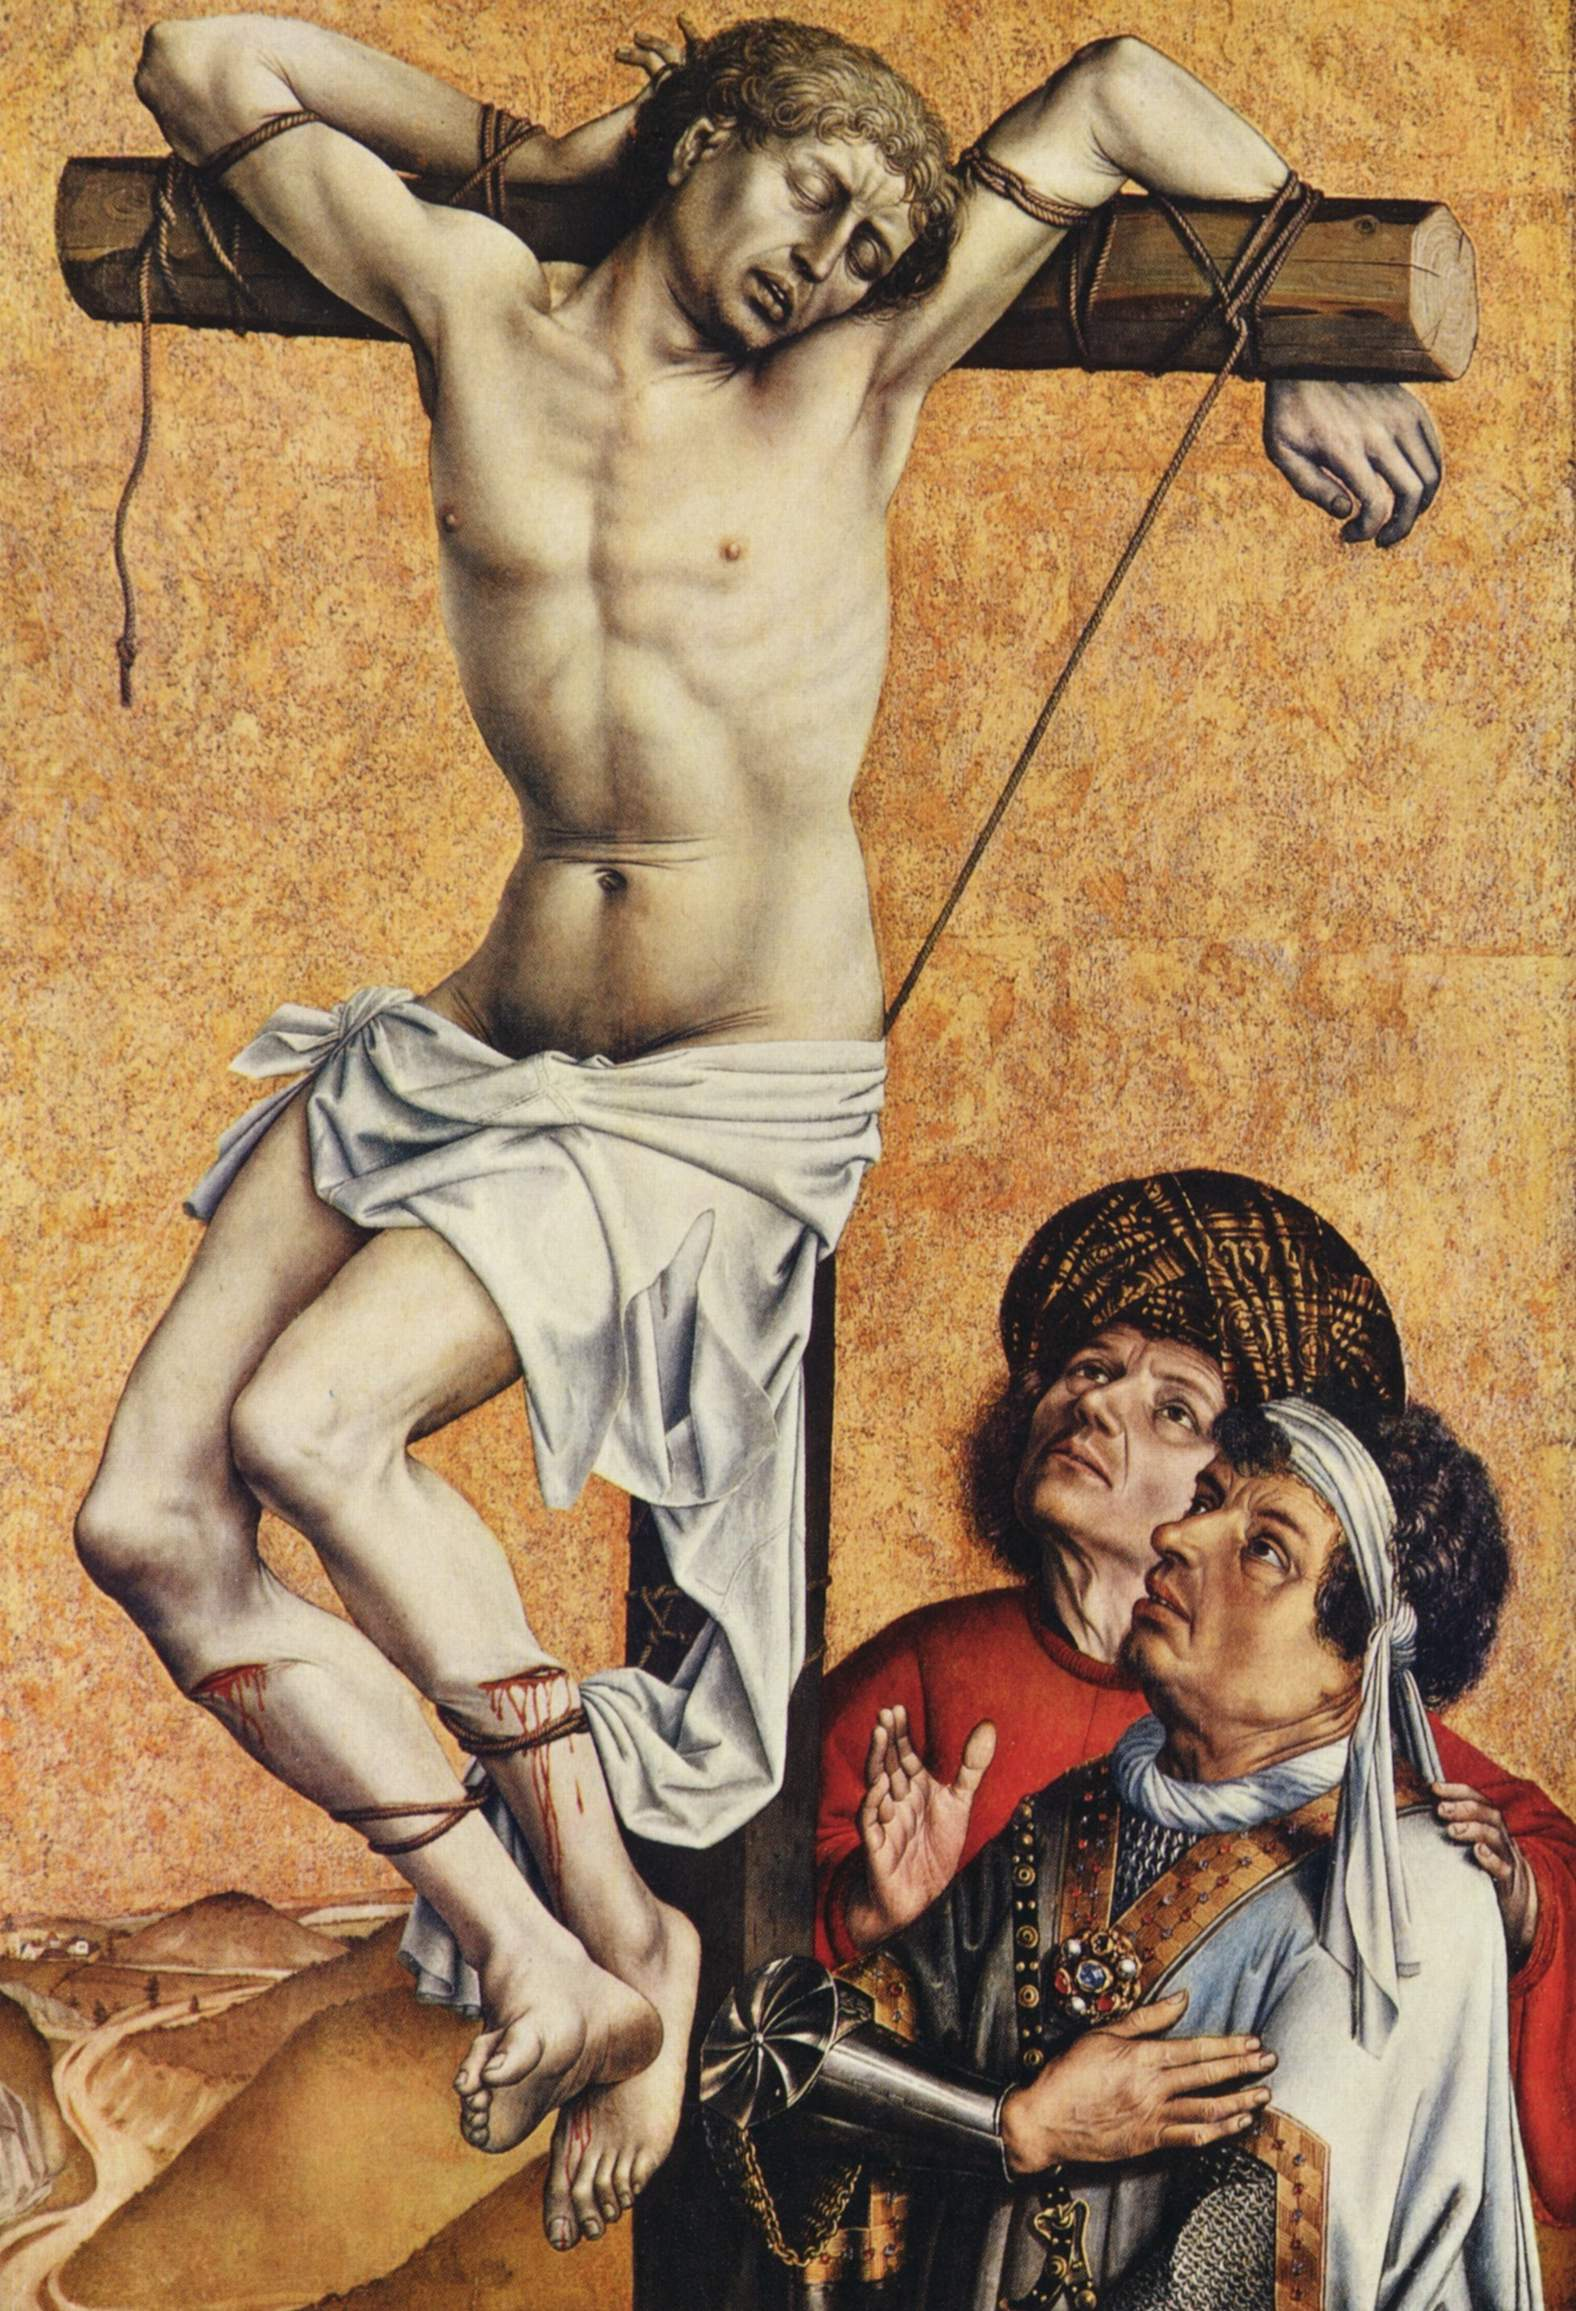 Christ-Roi : Reconnaître l'innocent dans Communauté spirituelle Robert_Campin_004